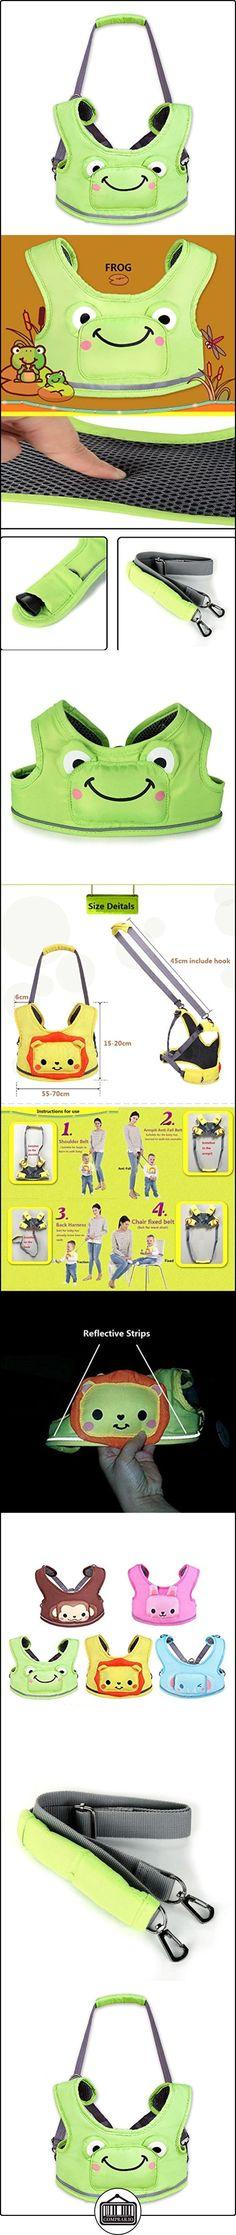 Arnés de seguridad para bebés - Animal de dibujos animados Arnés de seguridad para niños pequeños con tiras reflectantes, 3 en 1, la opción preferida de mamá  ✿ Seguridad para tu bebé - (Protege a tus hijos) ✿ ▬► Ver oferta: http://comprar.io/goto/B01N2O5A73